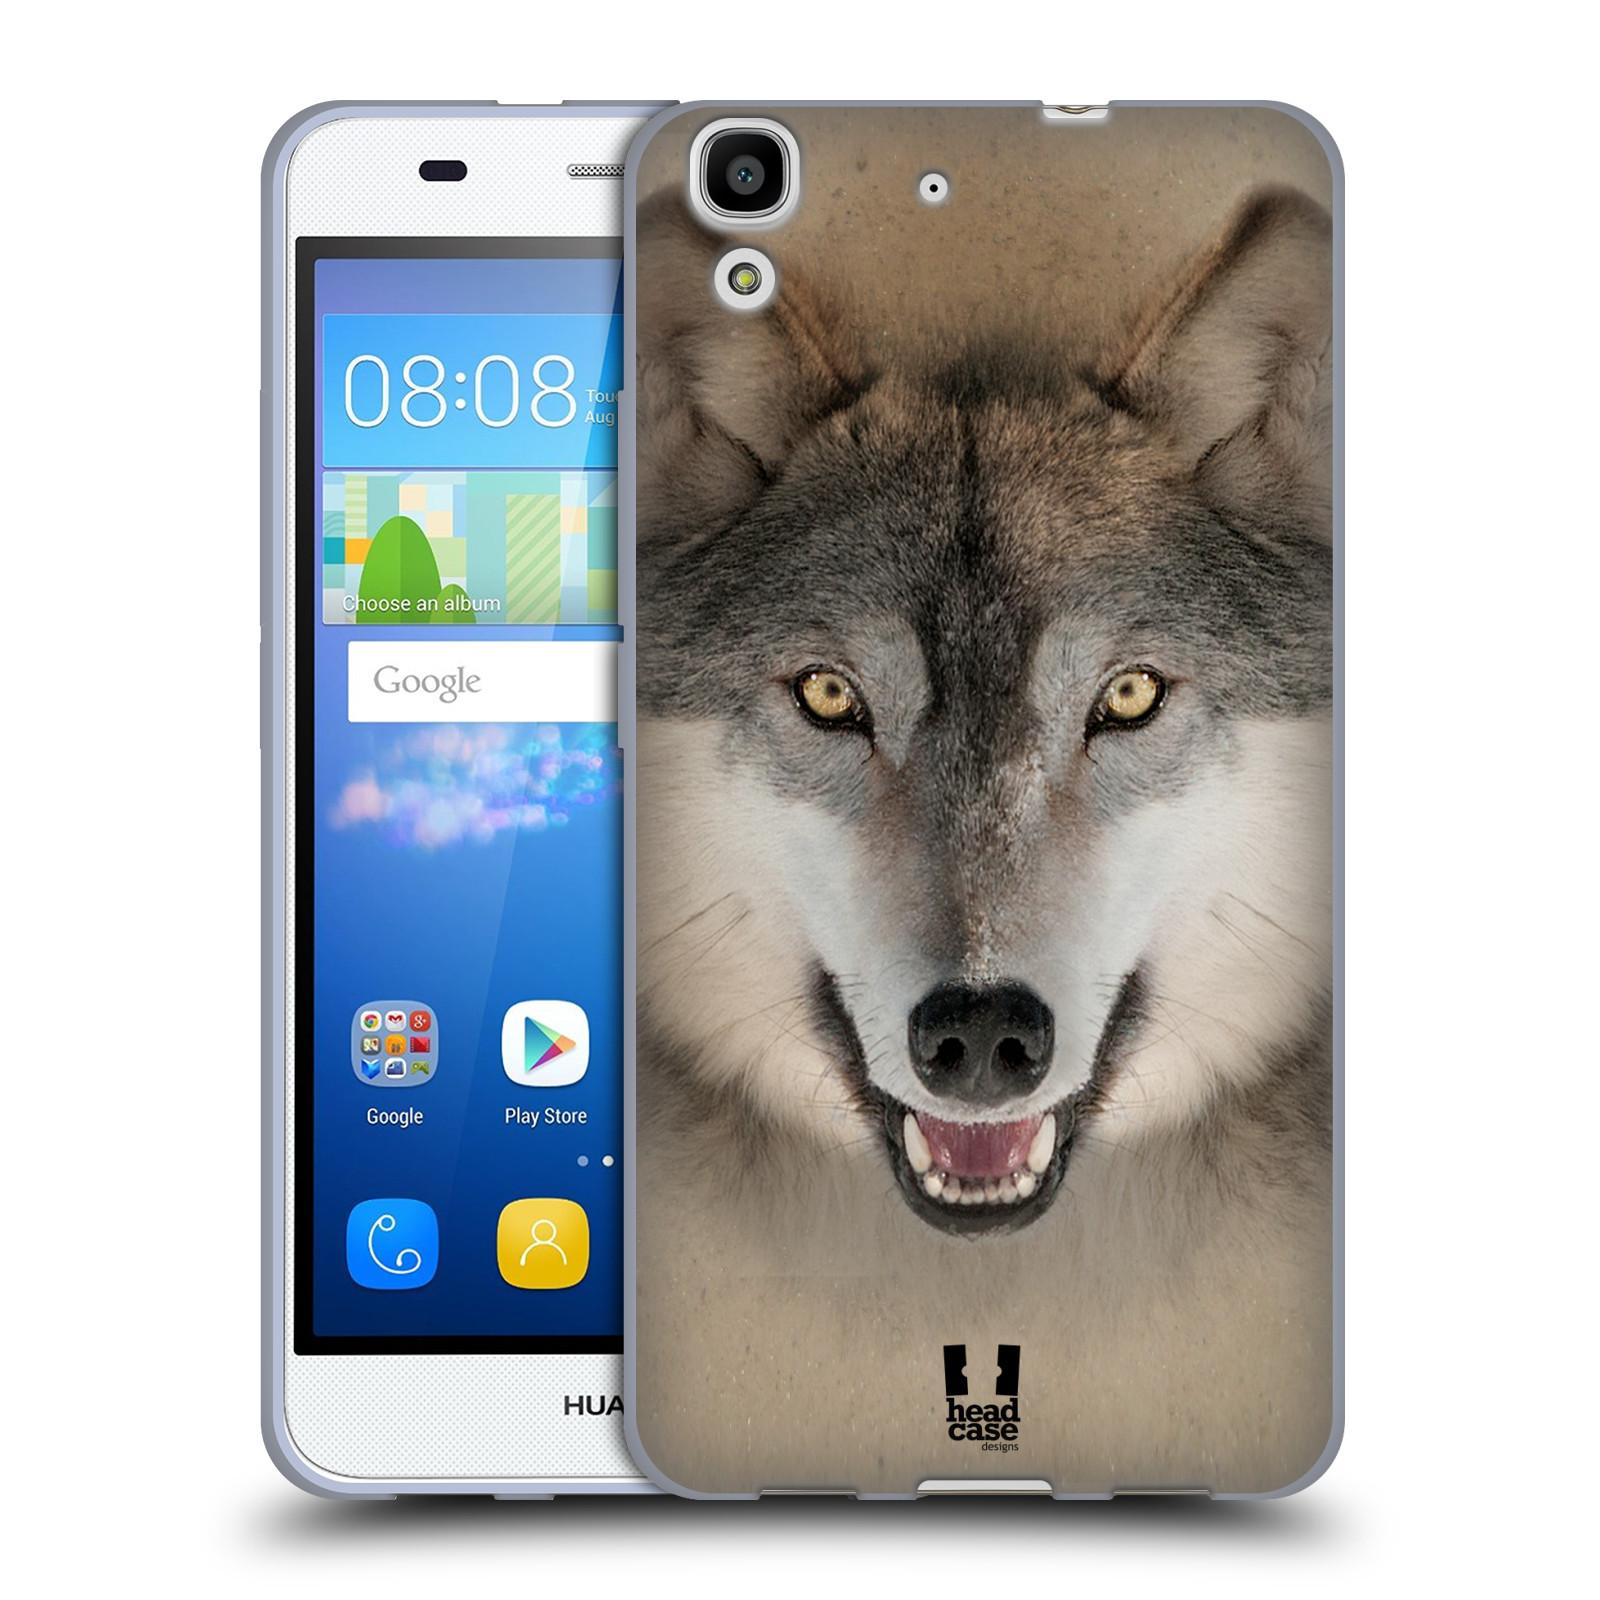 HEAD CASE silikonový obal na mobil HUAWEI Y6 vzor Zvířecí tváře 2 vlk šedý